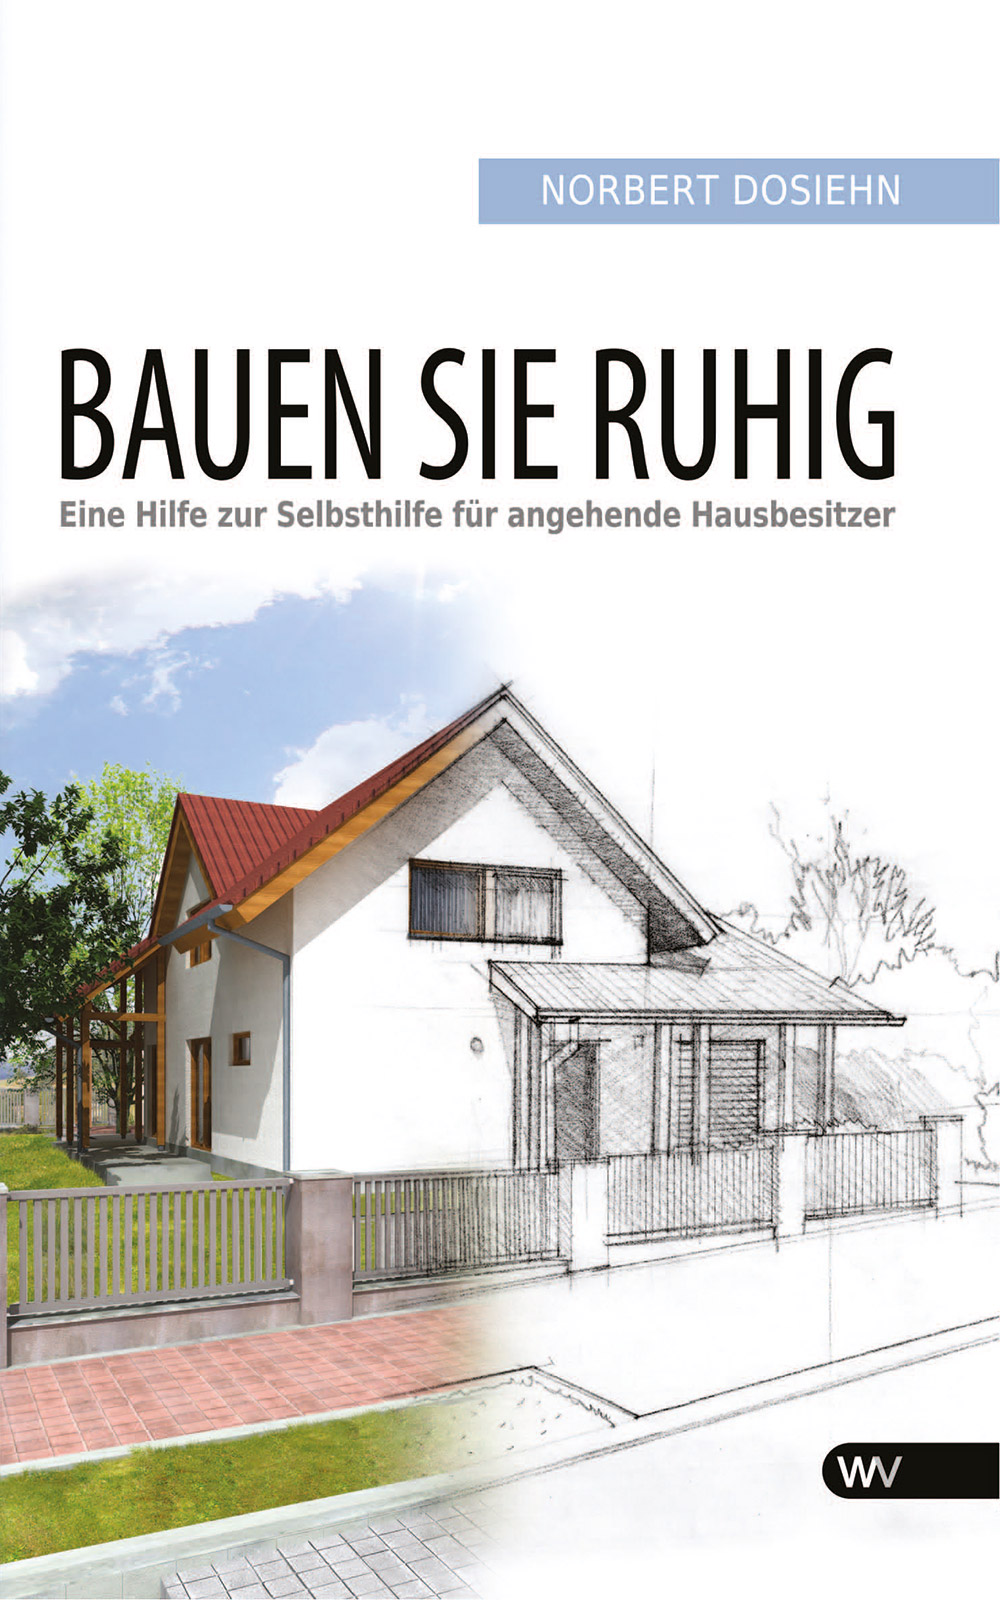 norbert dosiehn architekt architekten oberhausen. Black Bedroom Furniture Sets. Home Design Ideas